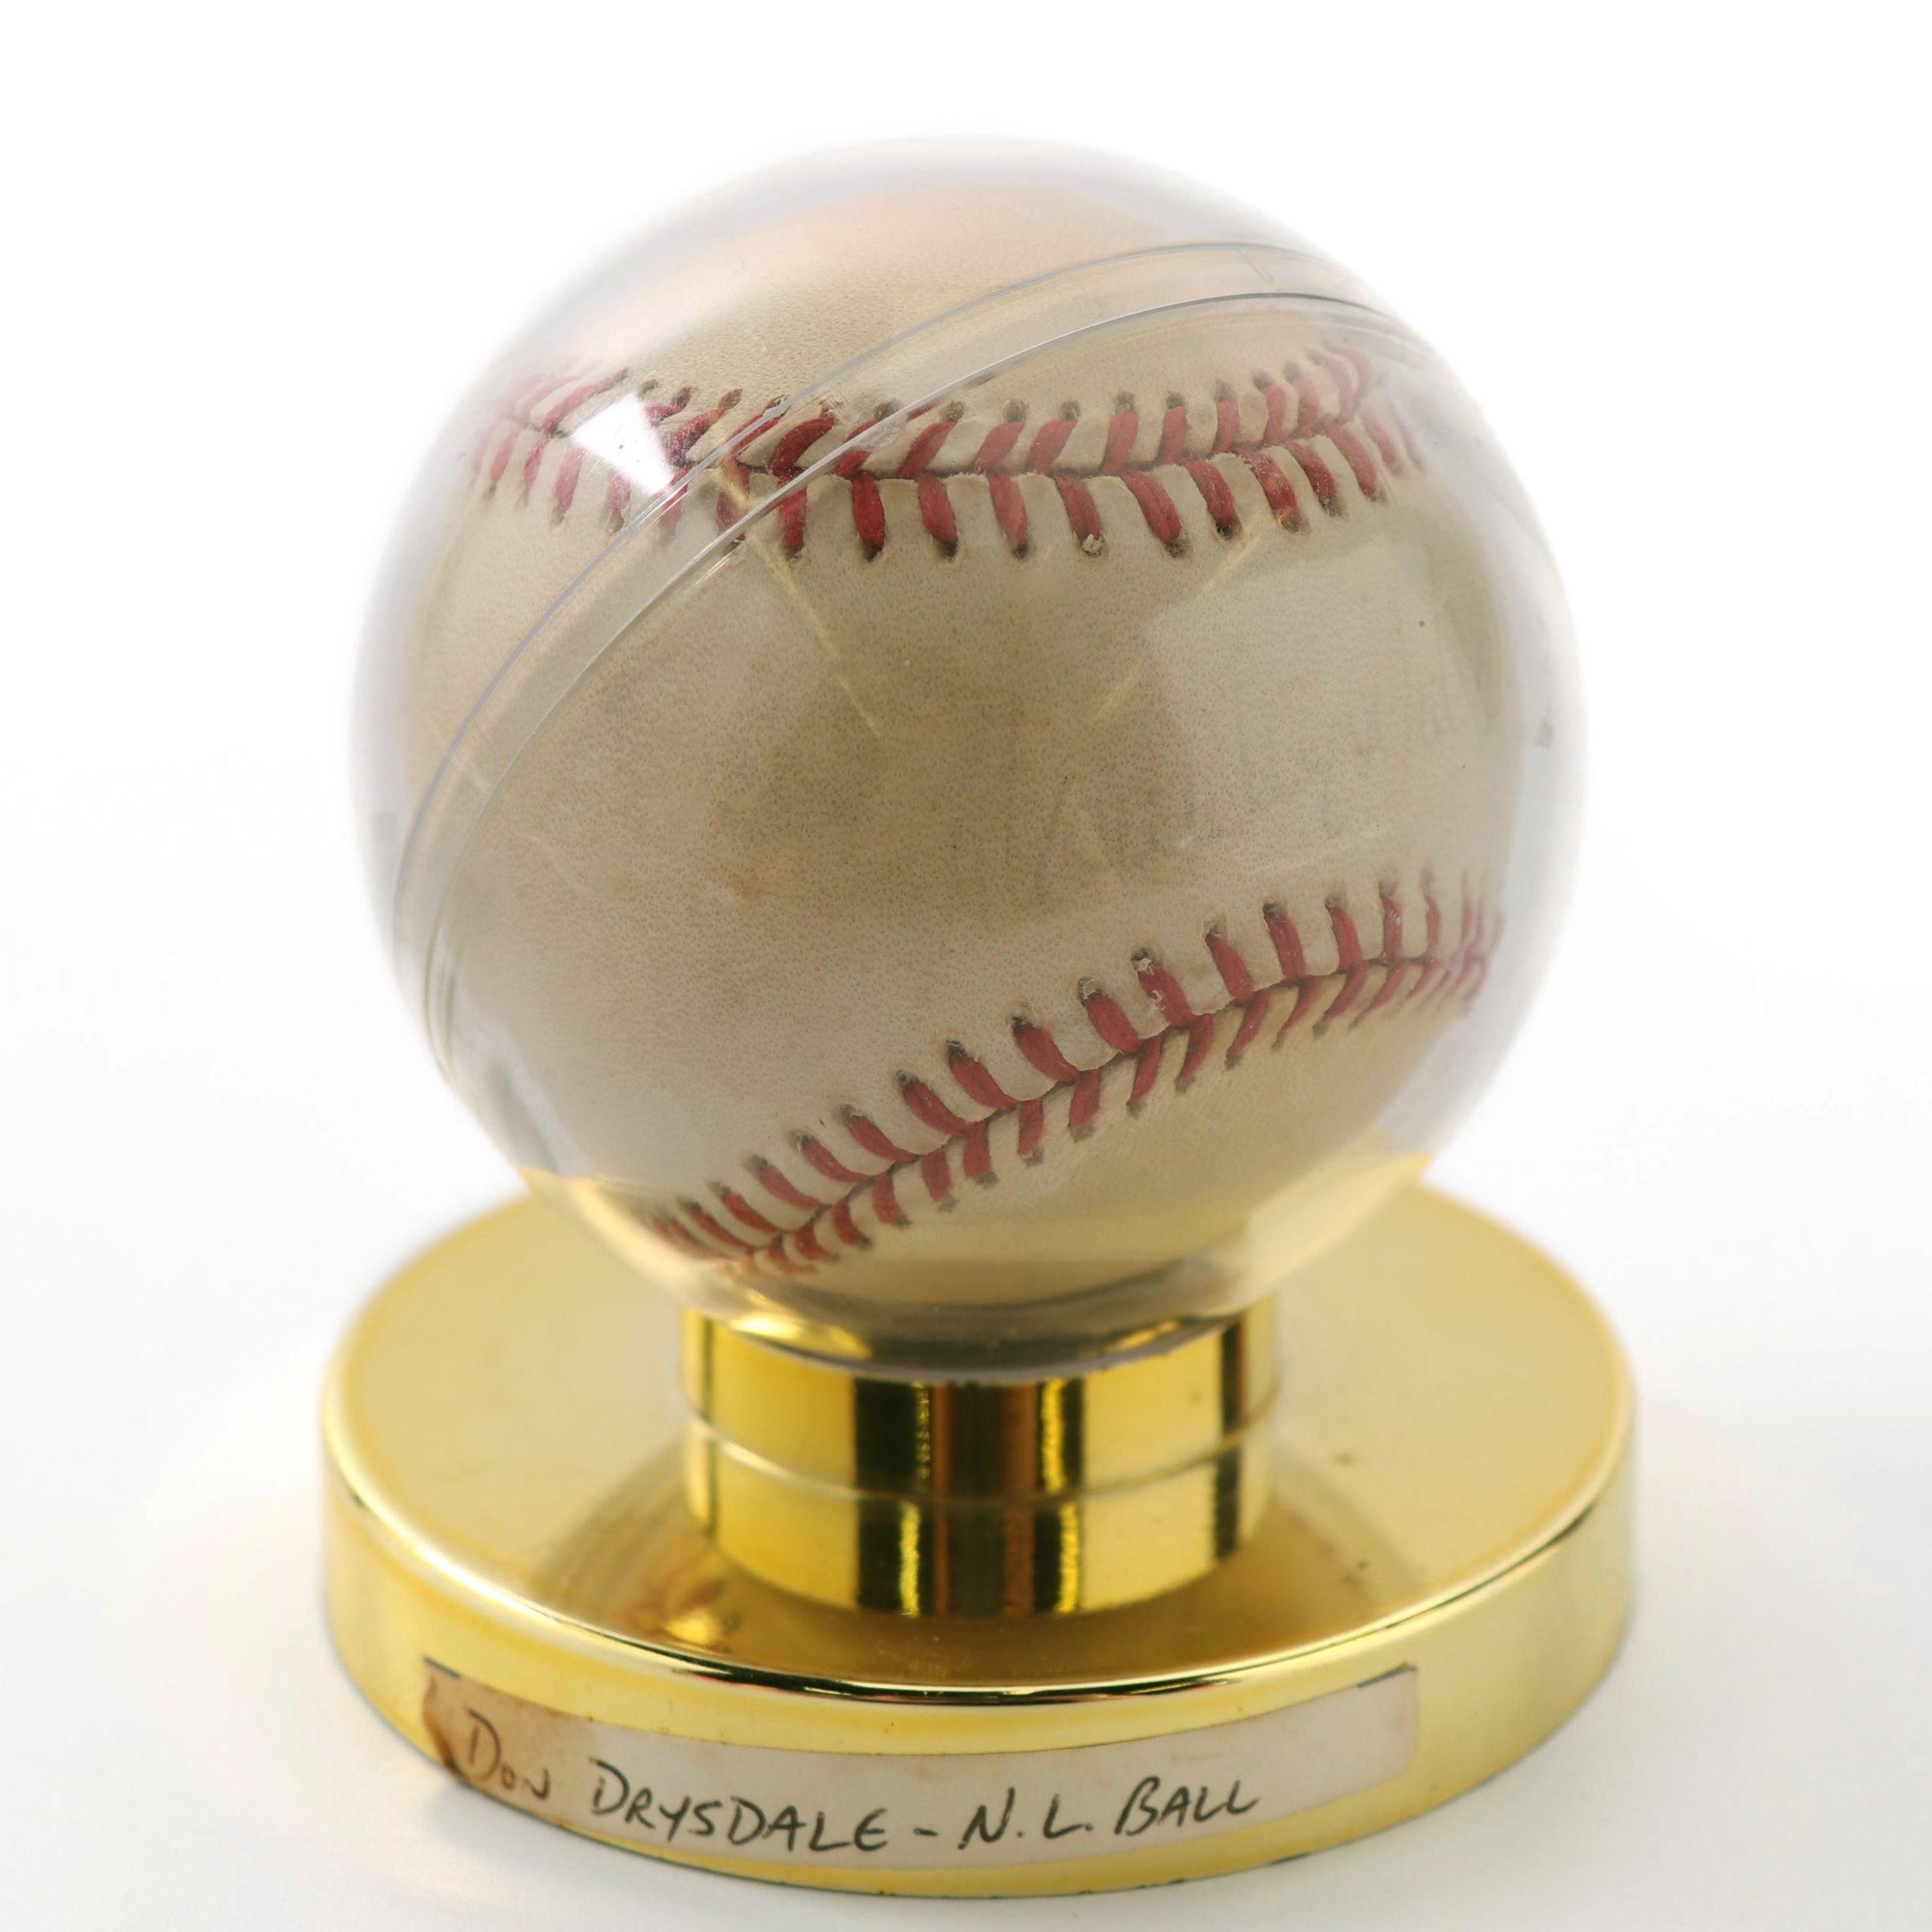 Don Drysdale Autographed Baseball